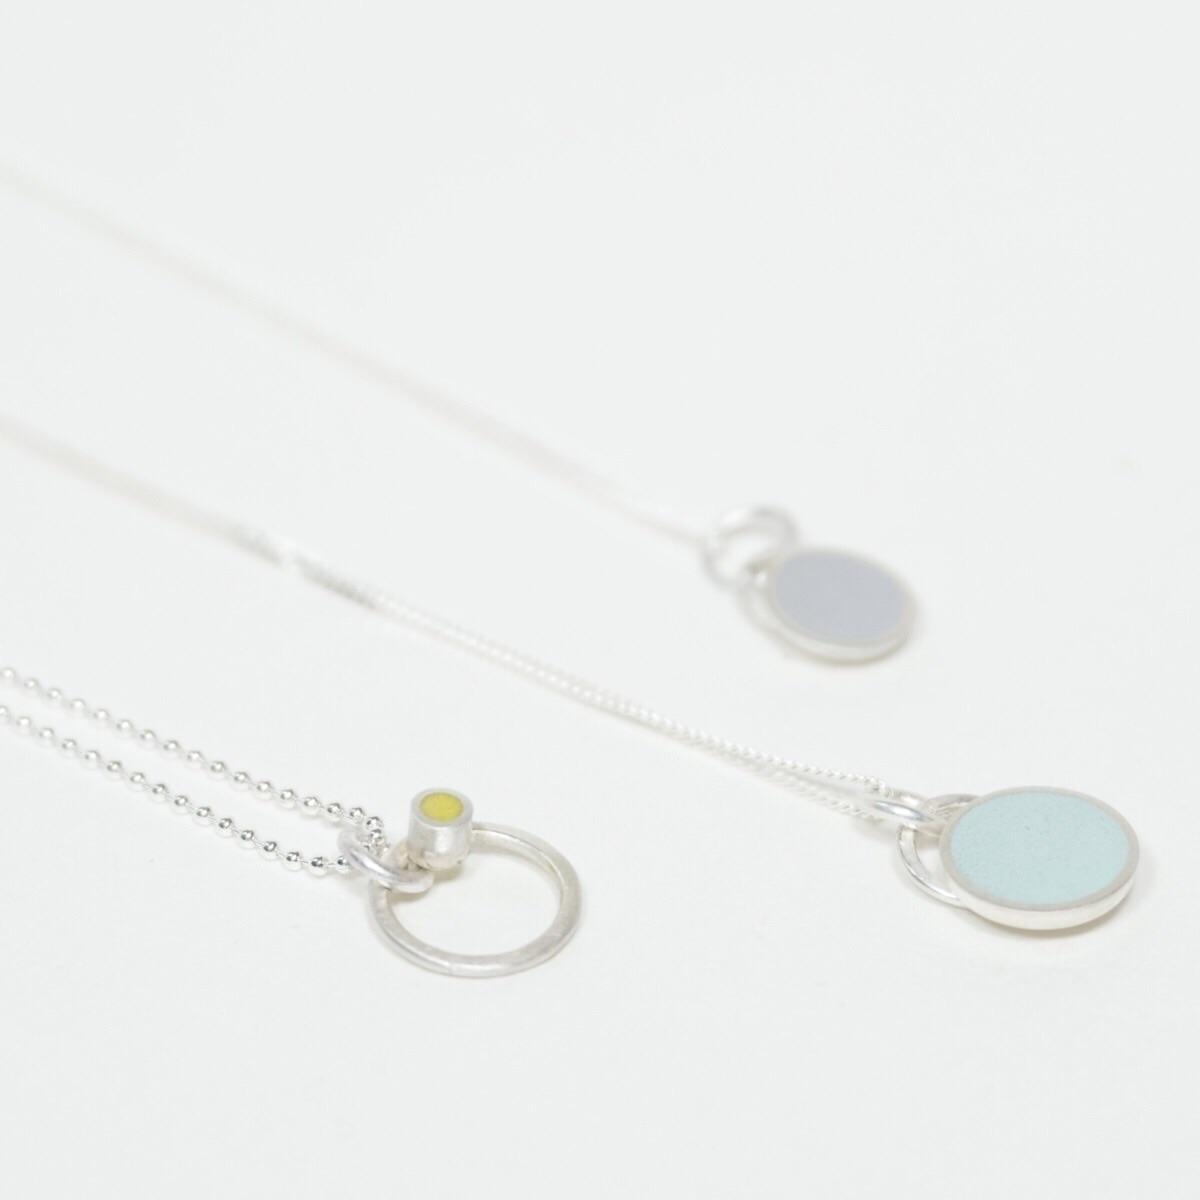 Small Colour Dot Pendant necklaces by Colour Designs Jewellery